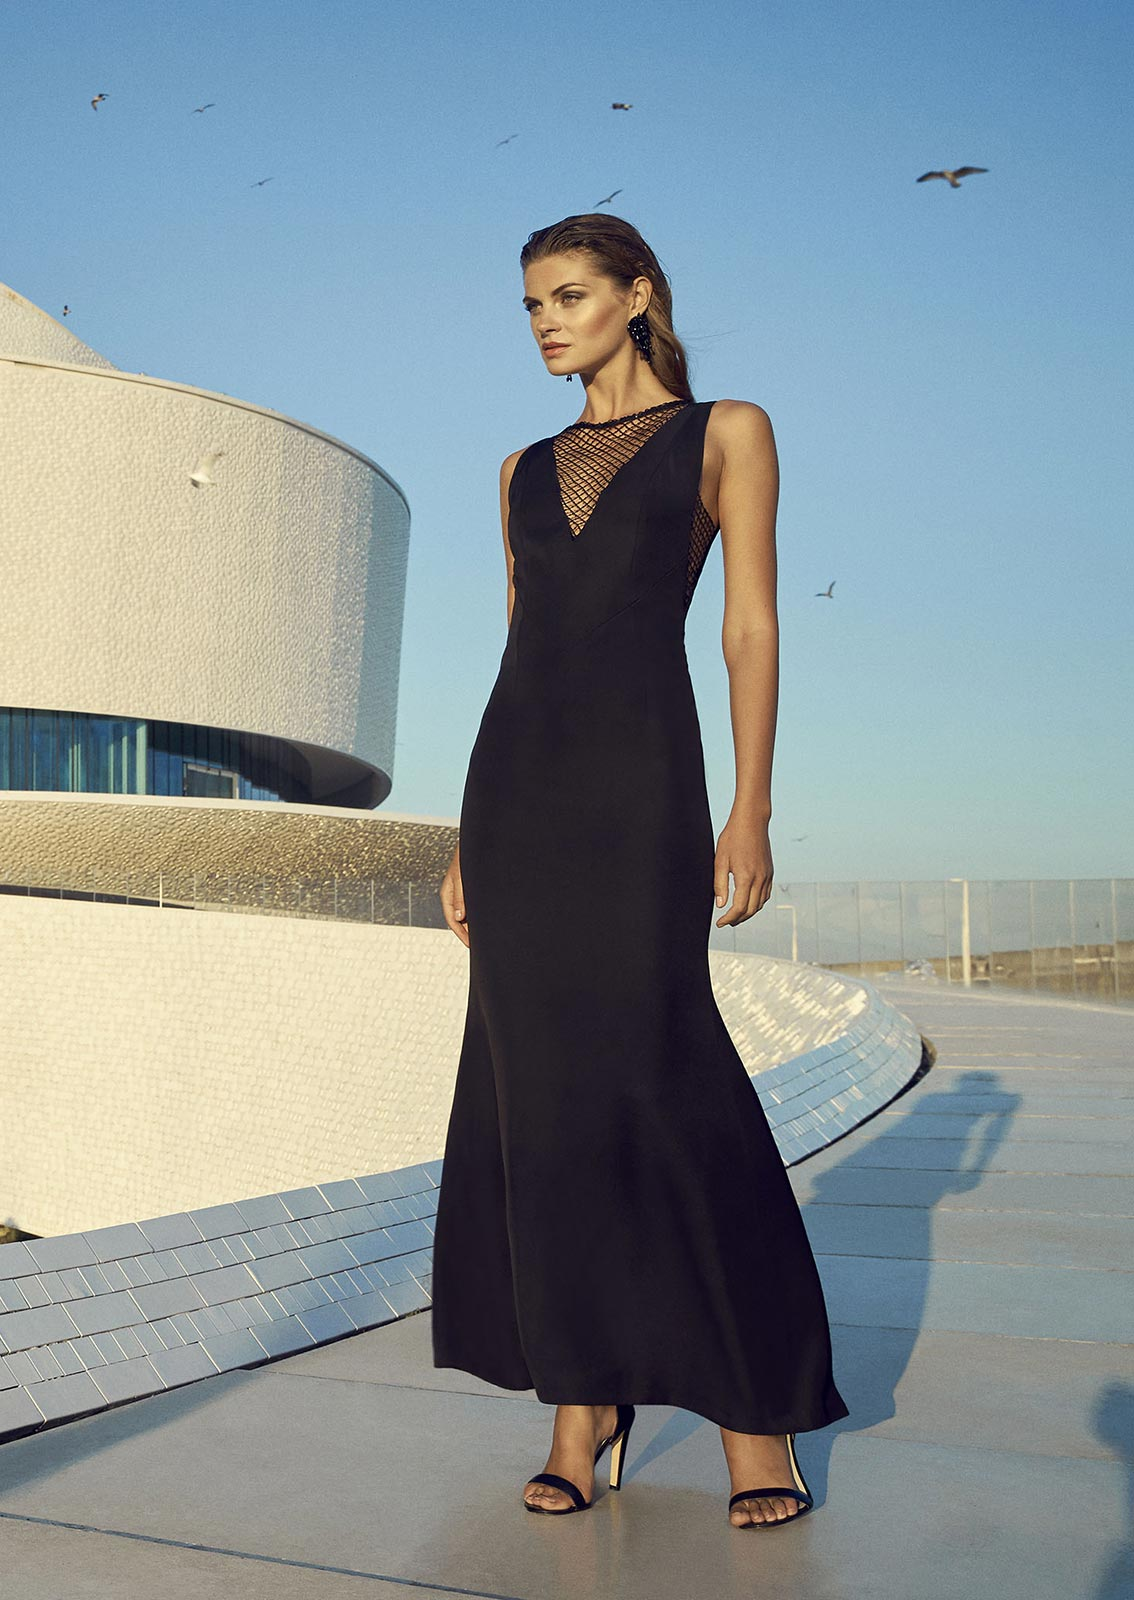 a10ab954c Vestido fiesta negro adornos paillettes